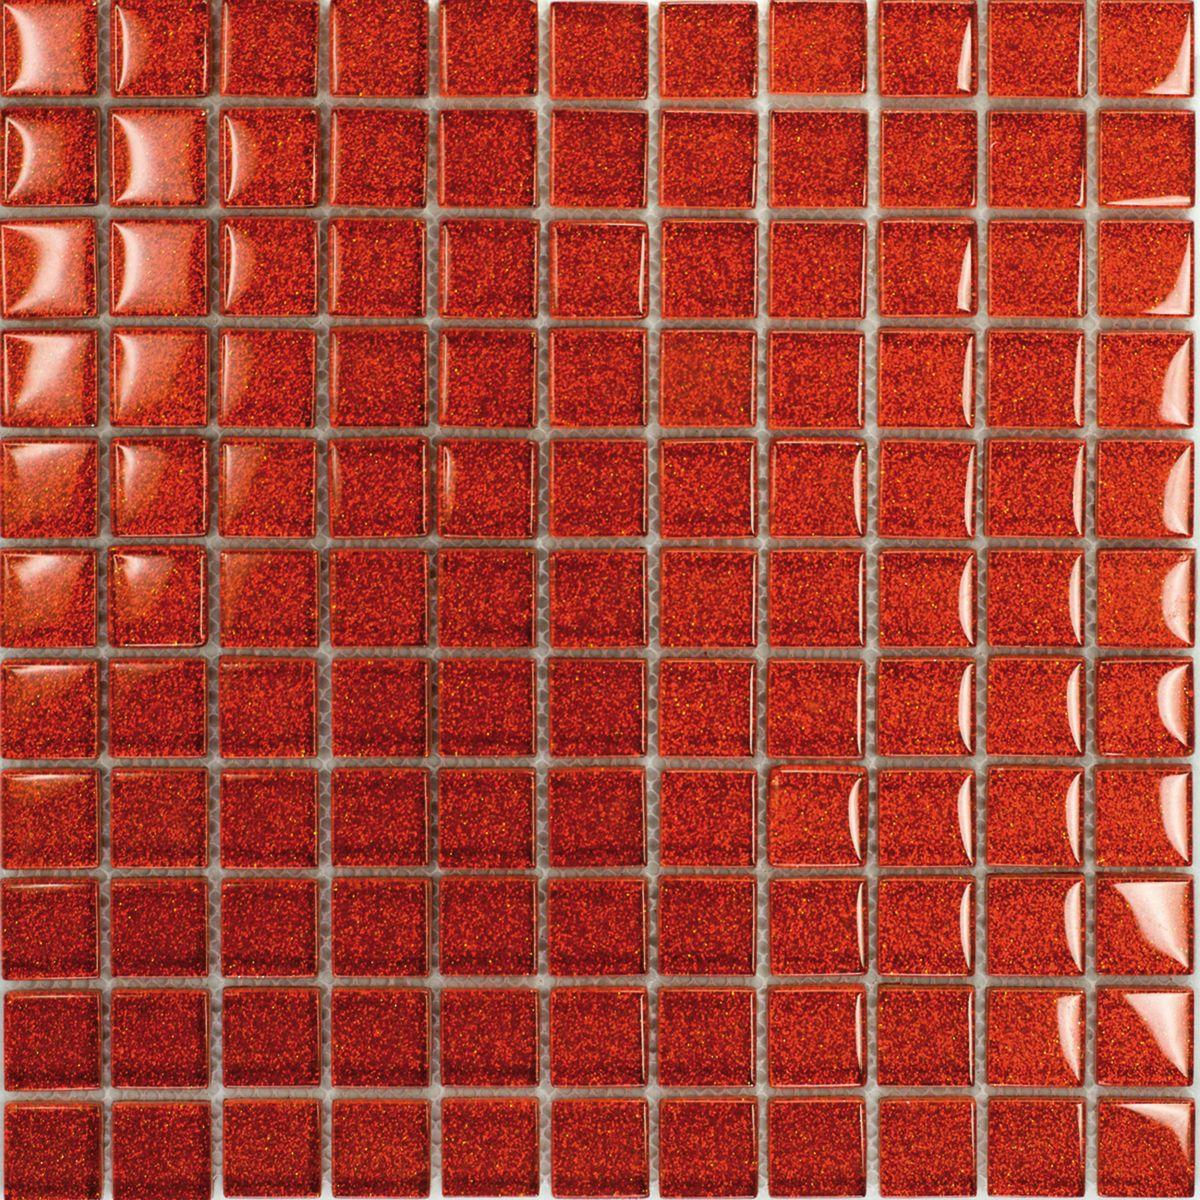 Piastrelle rosse bagno stunning piastrelle bagno moderno for Piastrelle esagonali bricoman